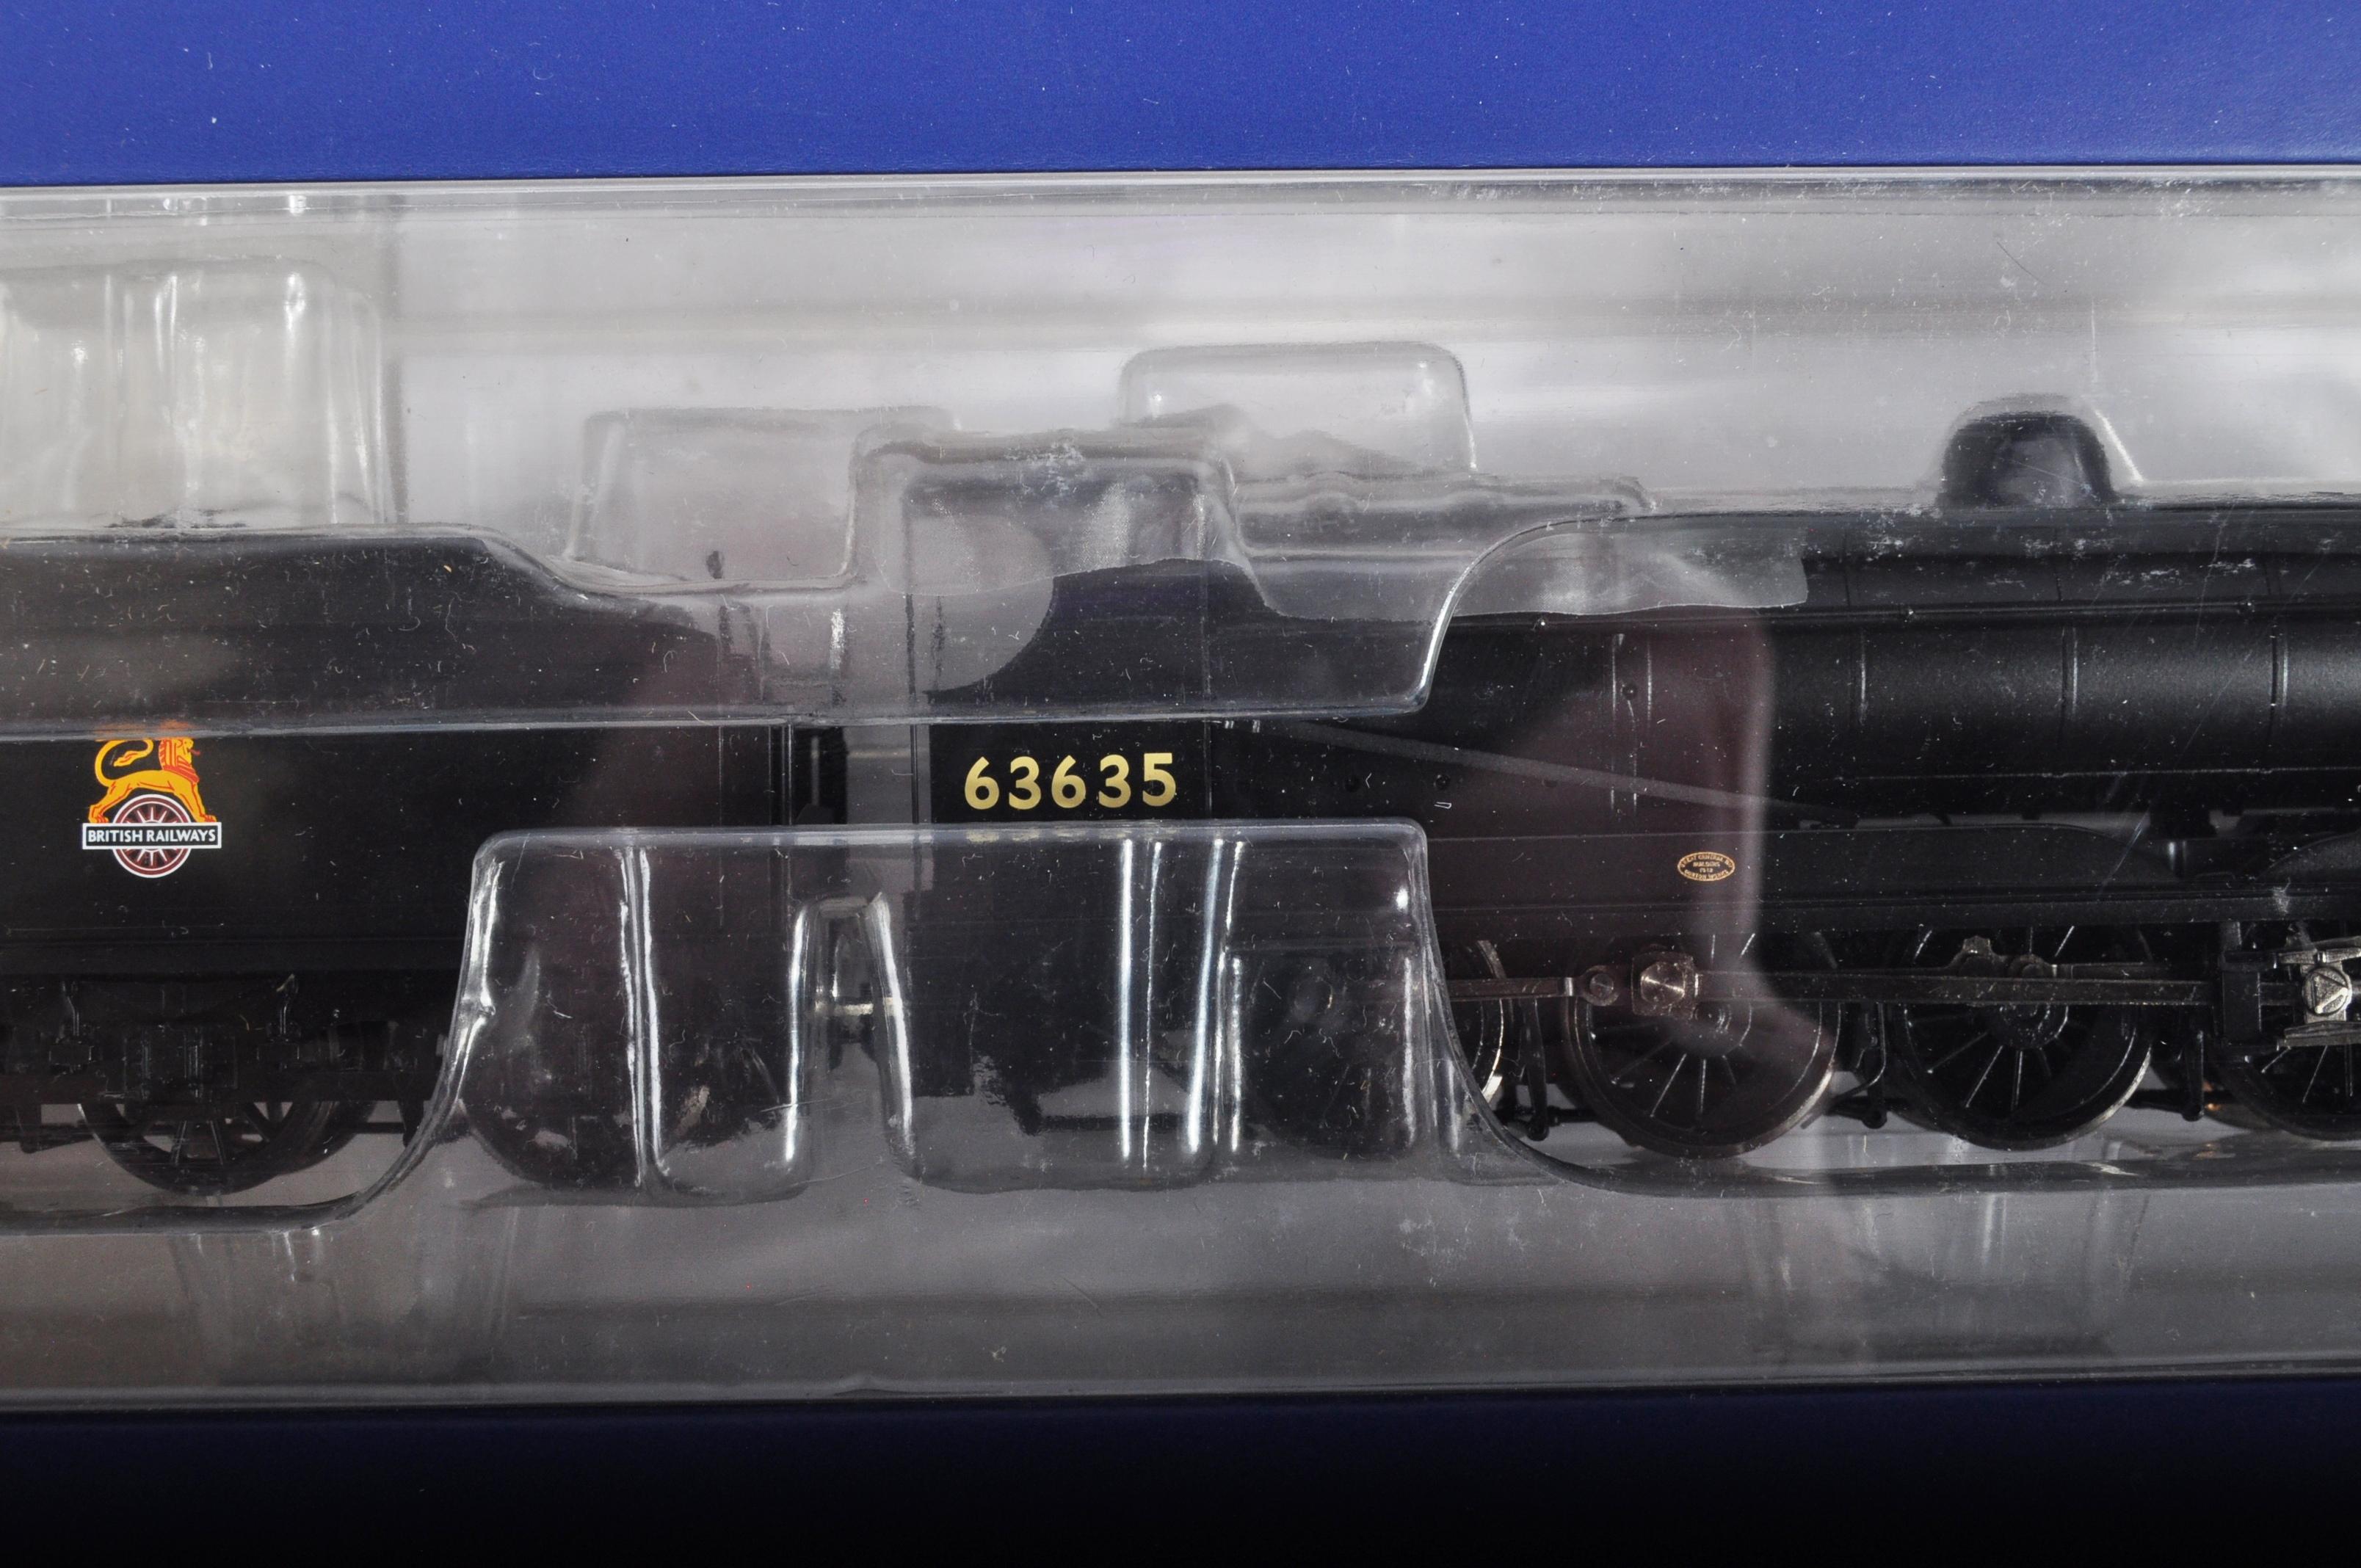 ORIGINAL BACHMANN BRANCH LINE 00 GAUGE MODEL RAILWAY LOCOMOTIVE - Image 3 of 5